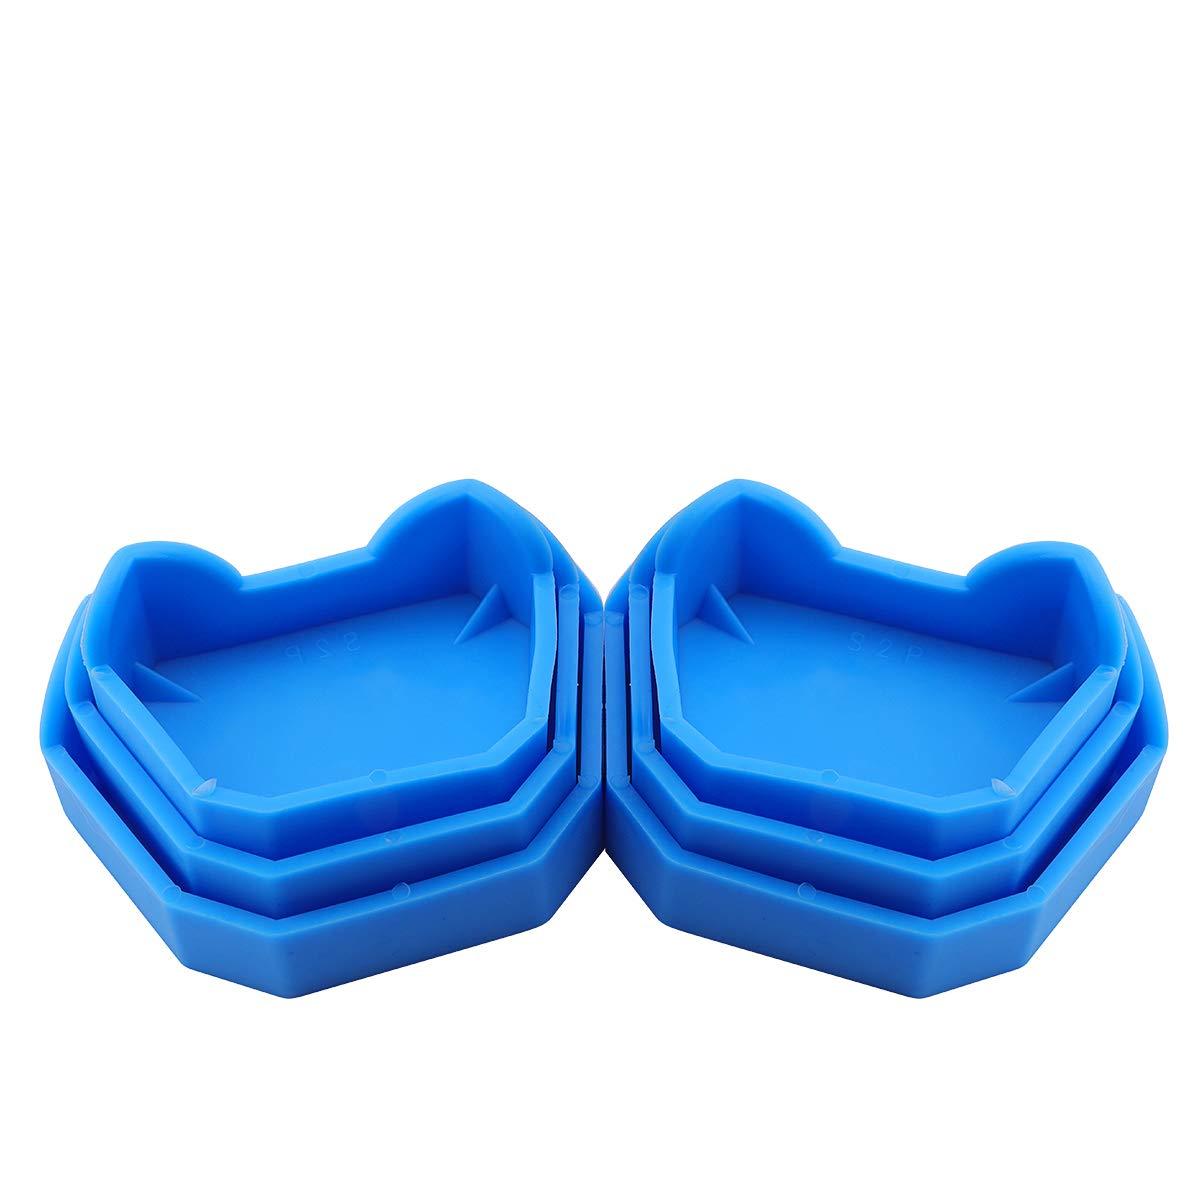 ANNWAH Dental Model Base Former Now on sale Denta Plaster 6PCS Max 44% OFF Kit Silicone